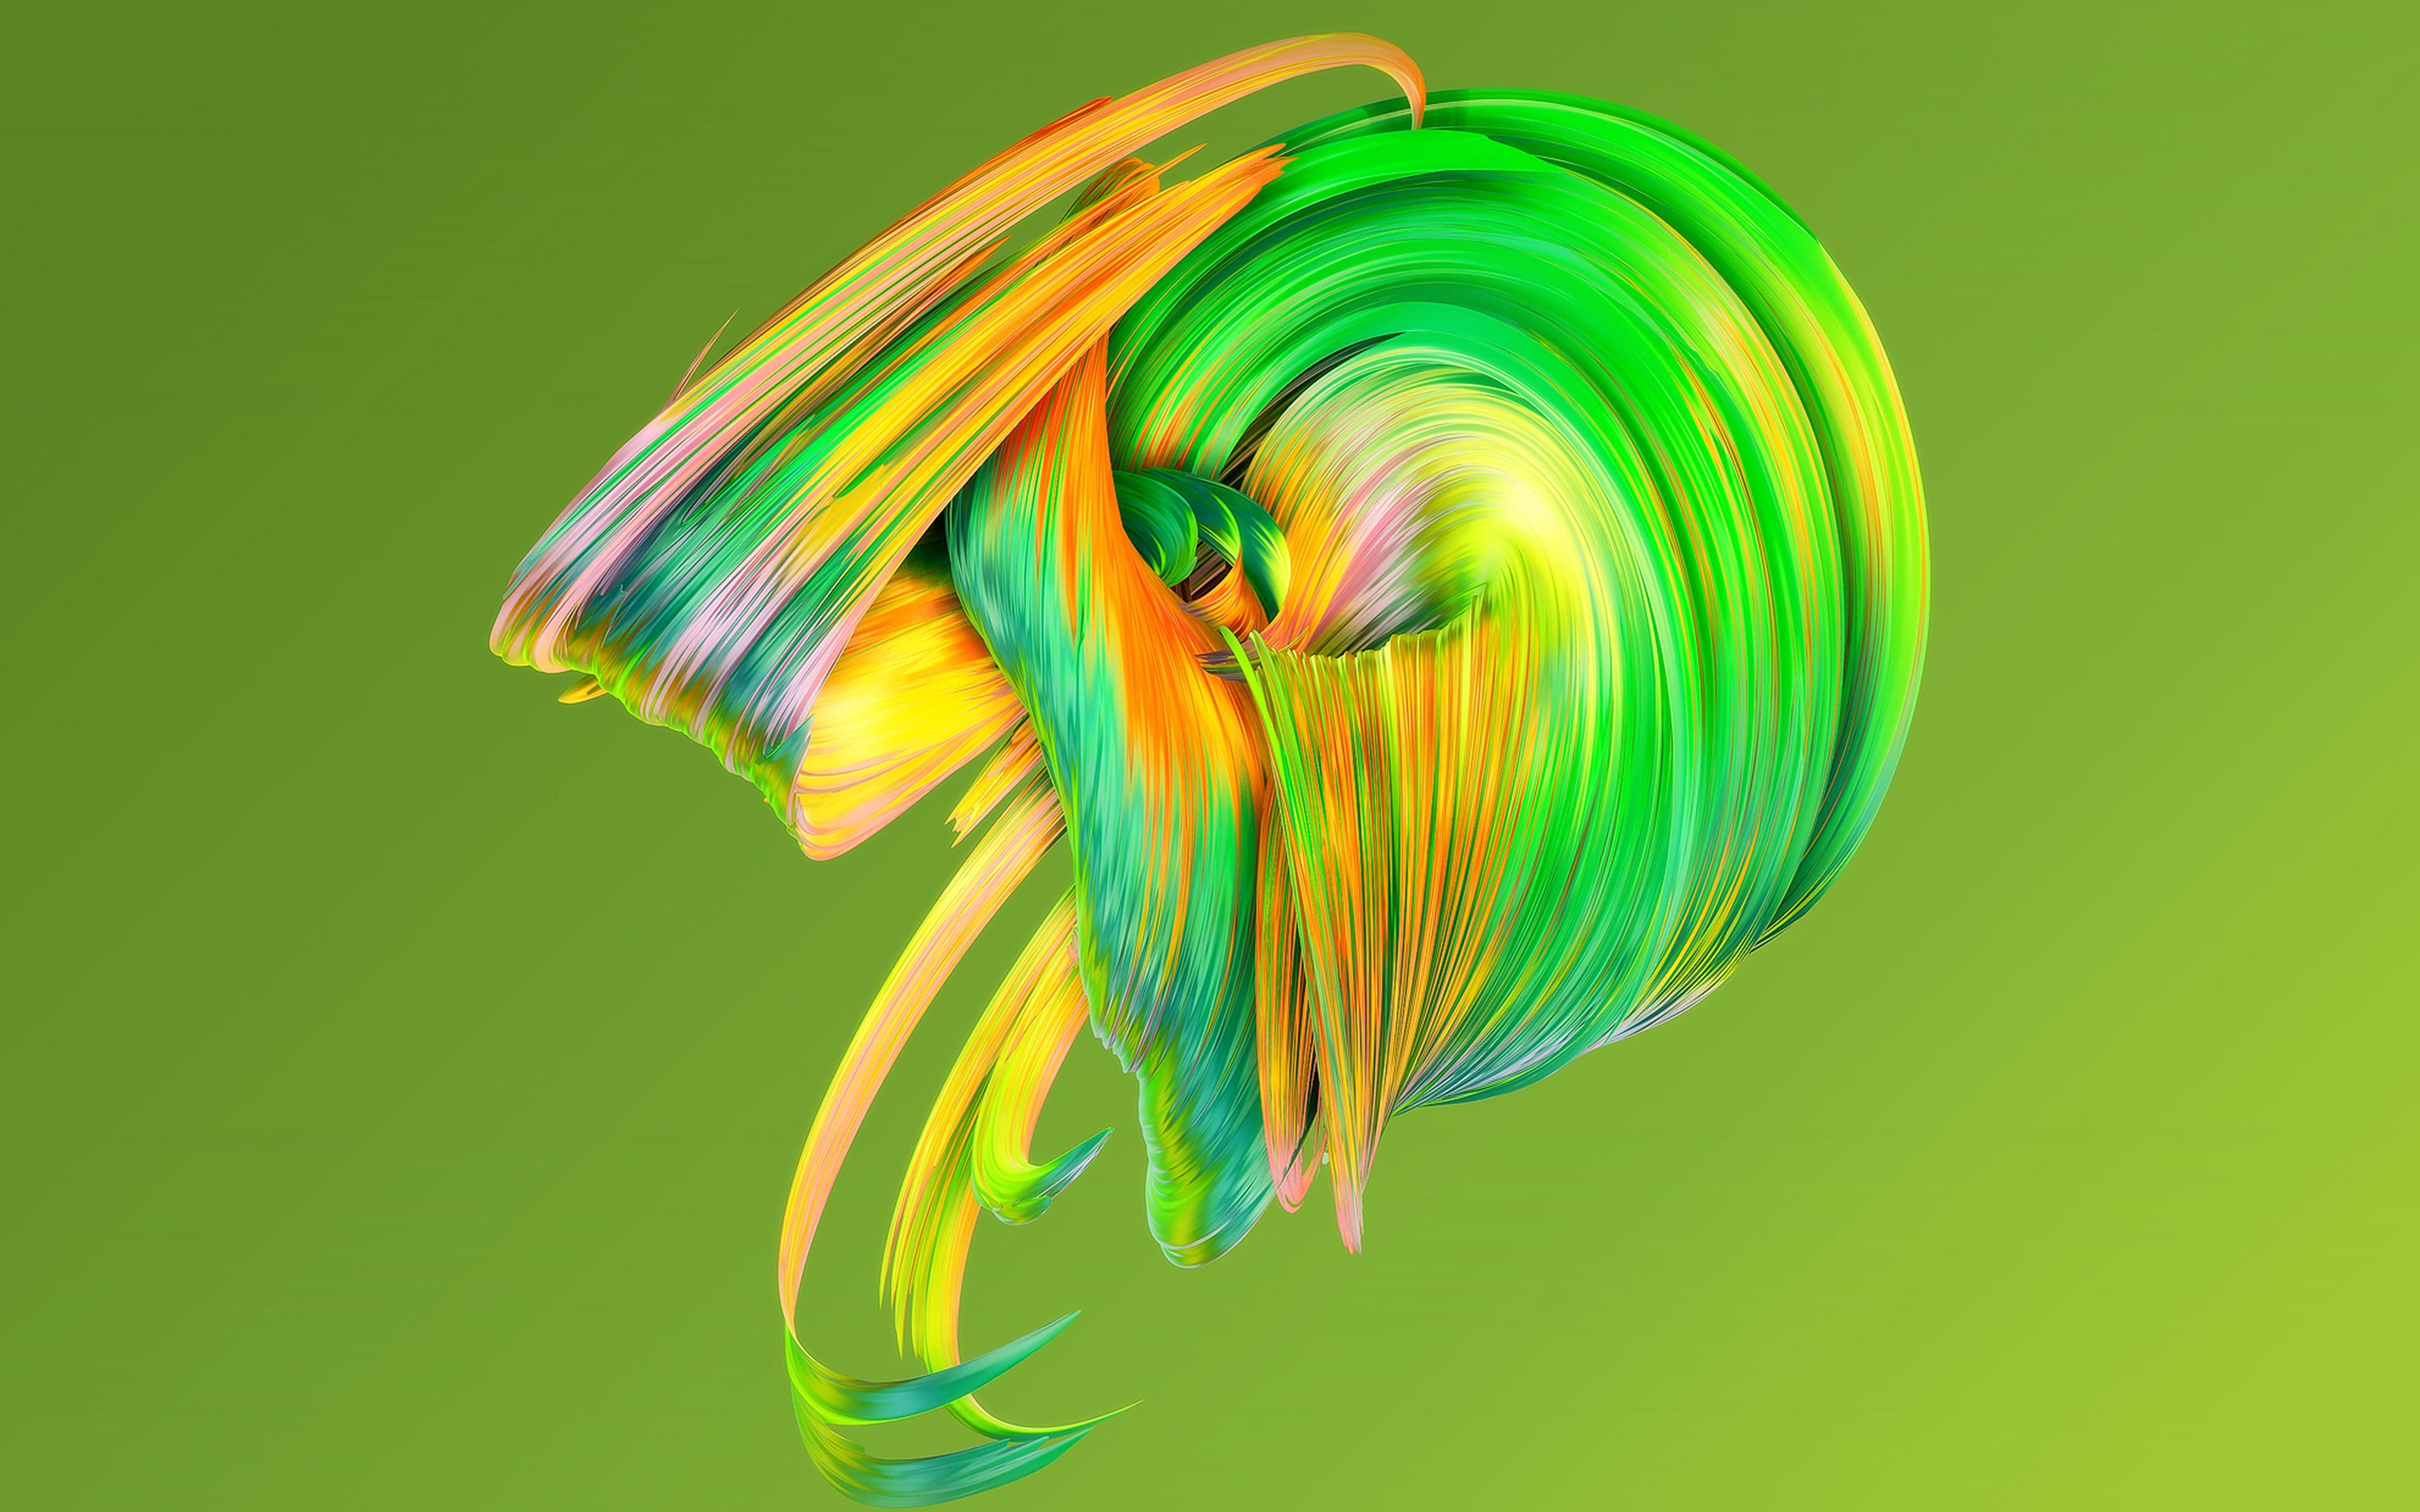 Sony Hd Wallpaper 74 Images: Vw74-abstract-digital-art-pattern-background-green-wallpaper